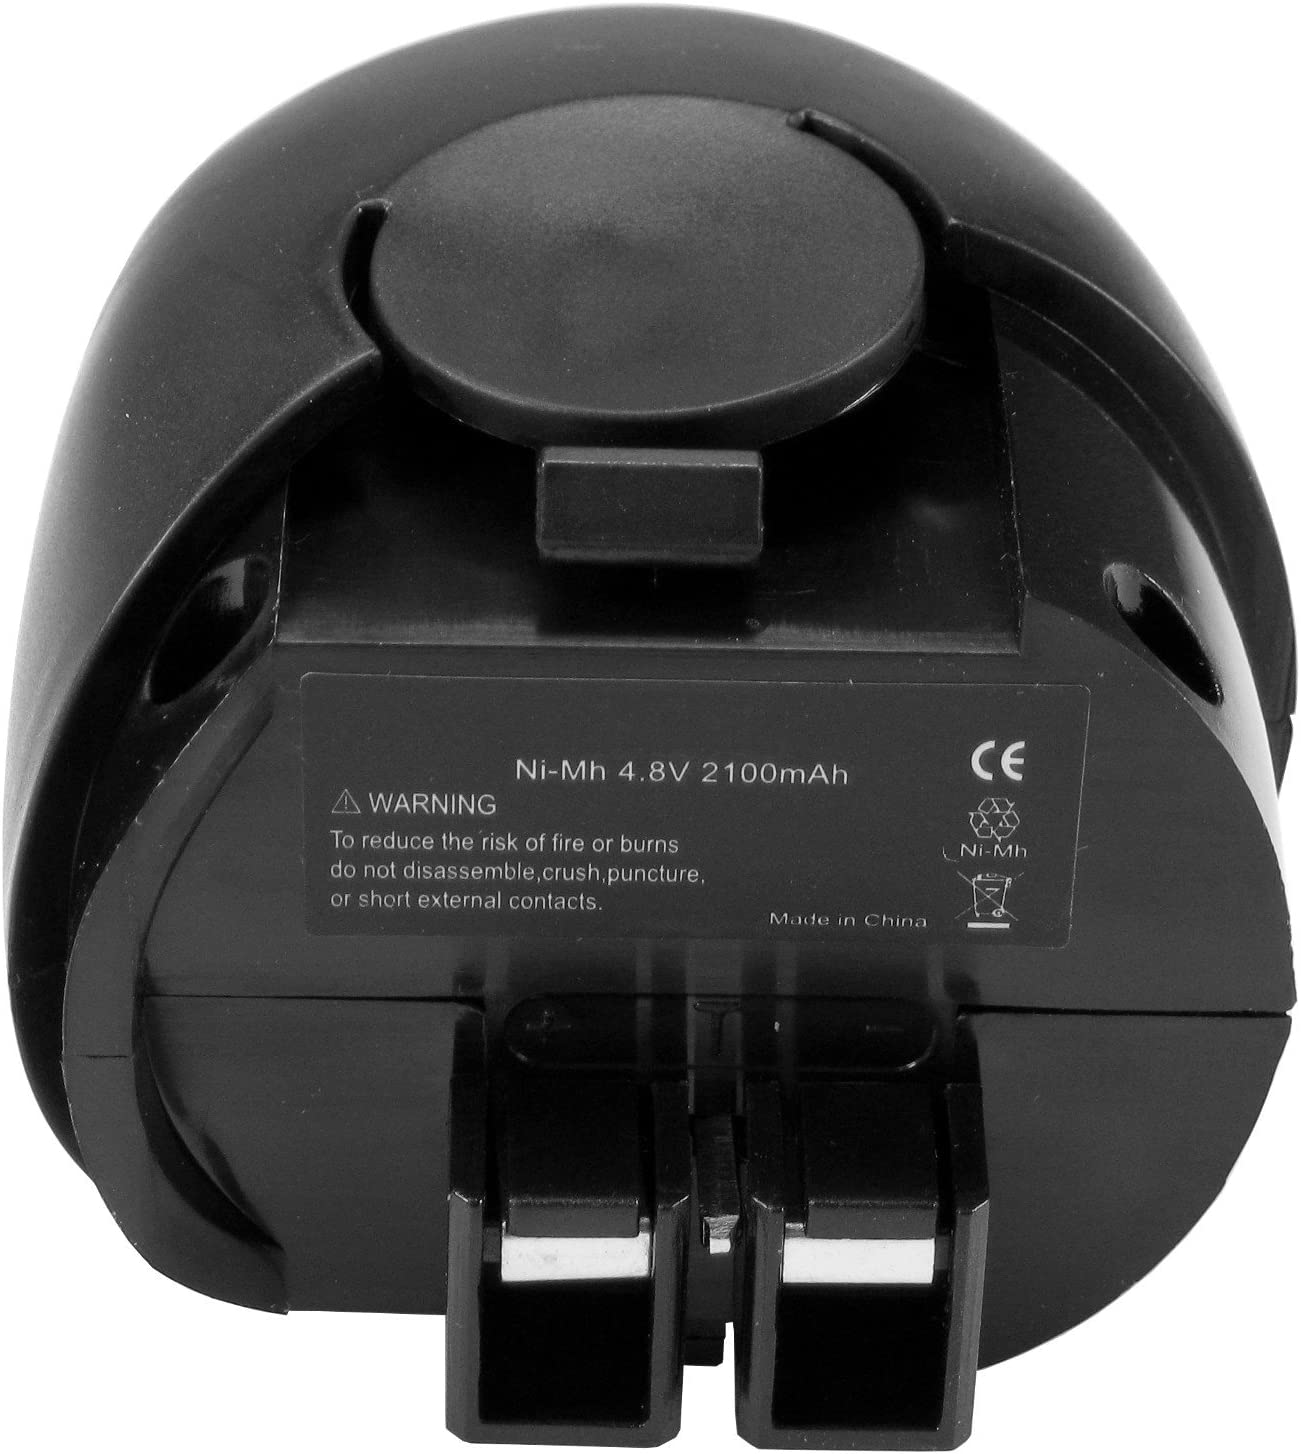 Joiry 4.8V 3.5Ah Ni-MH Batterie Ersetzen f/ür Metabo 6.27270 6.27271 6.27273 6.31858 60005952 631858000 PowerGrip 2 Powermaxx